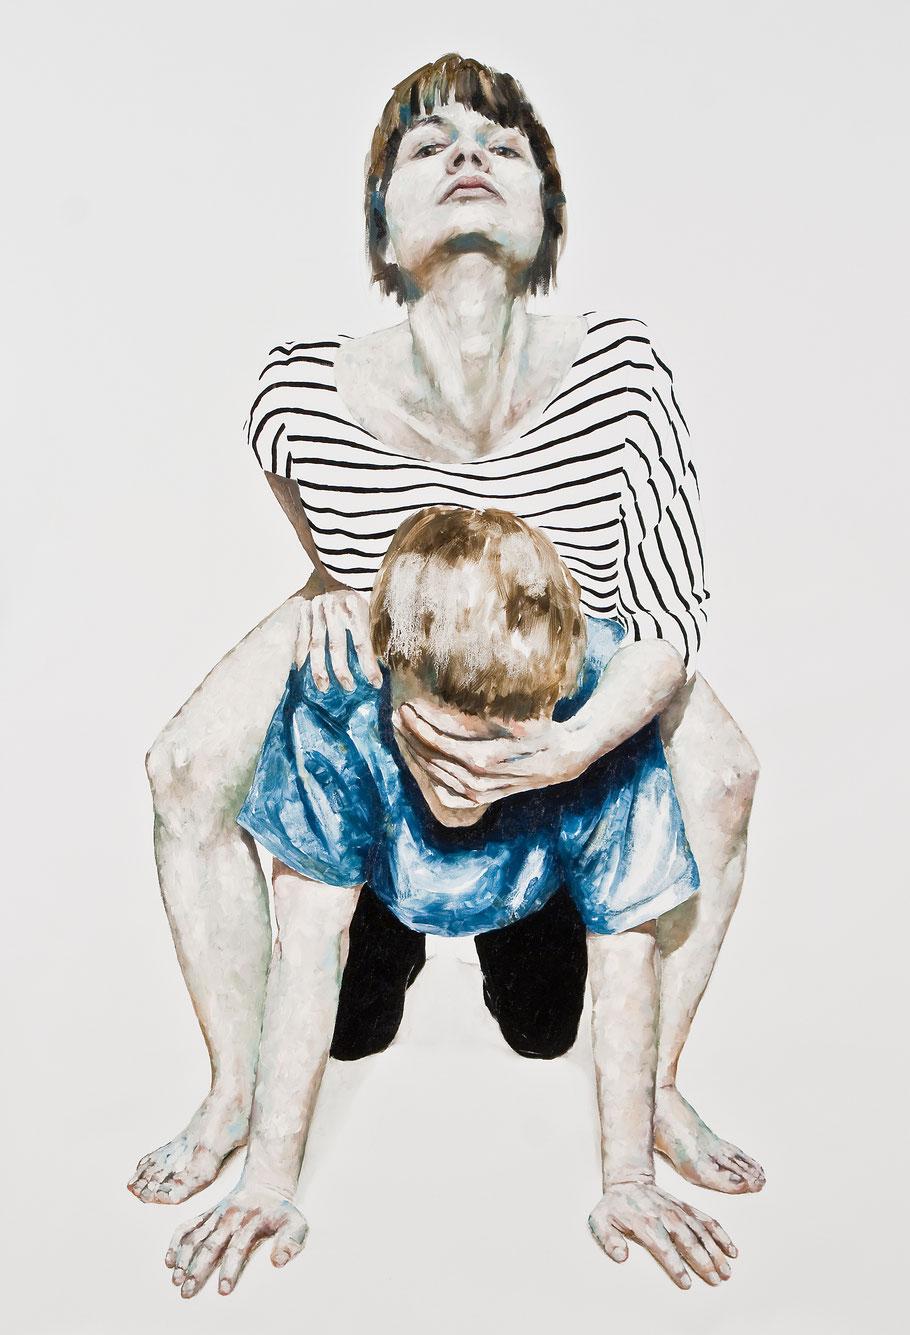 Öl auf Leinwand, 110 x 160 cm, 2012